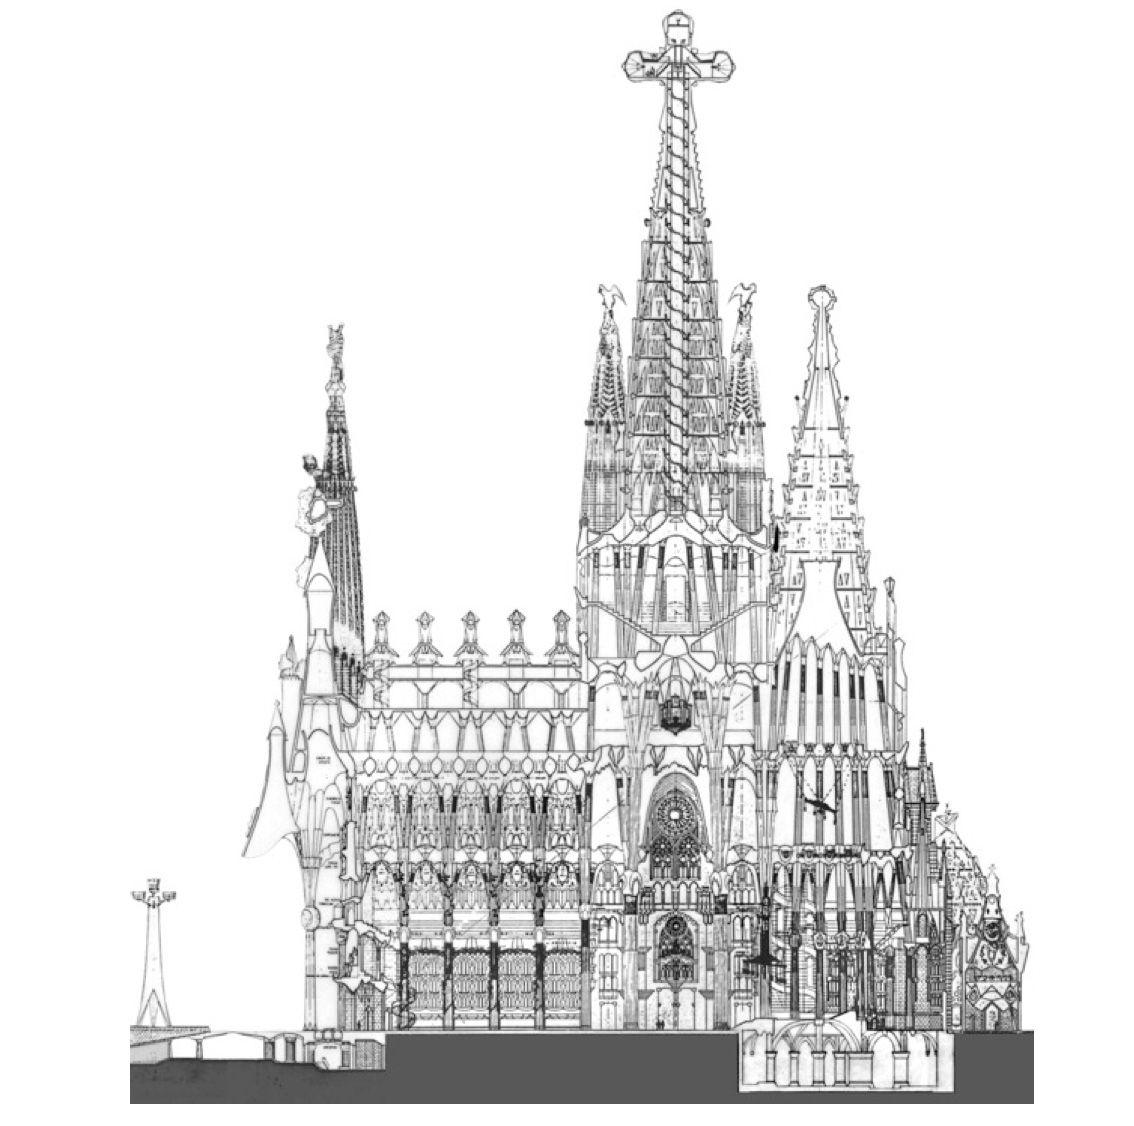 sagrada familia architectural drawings